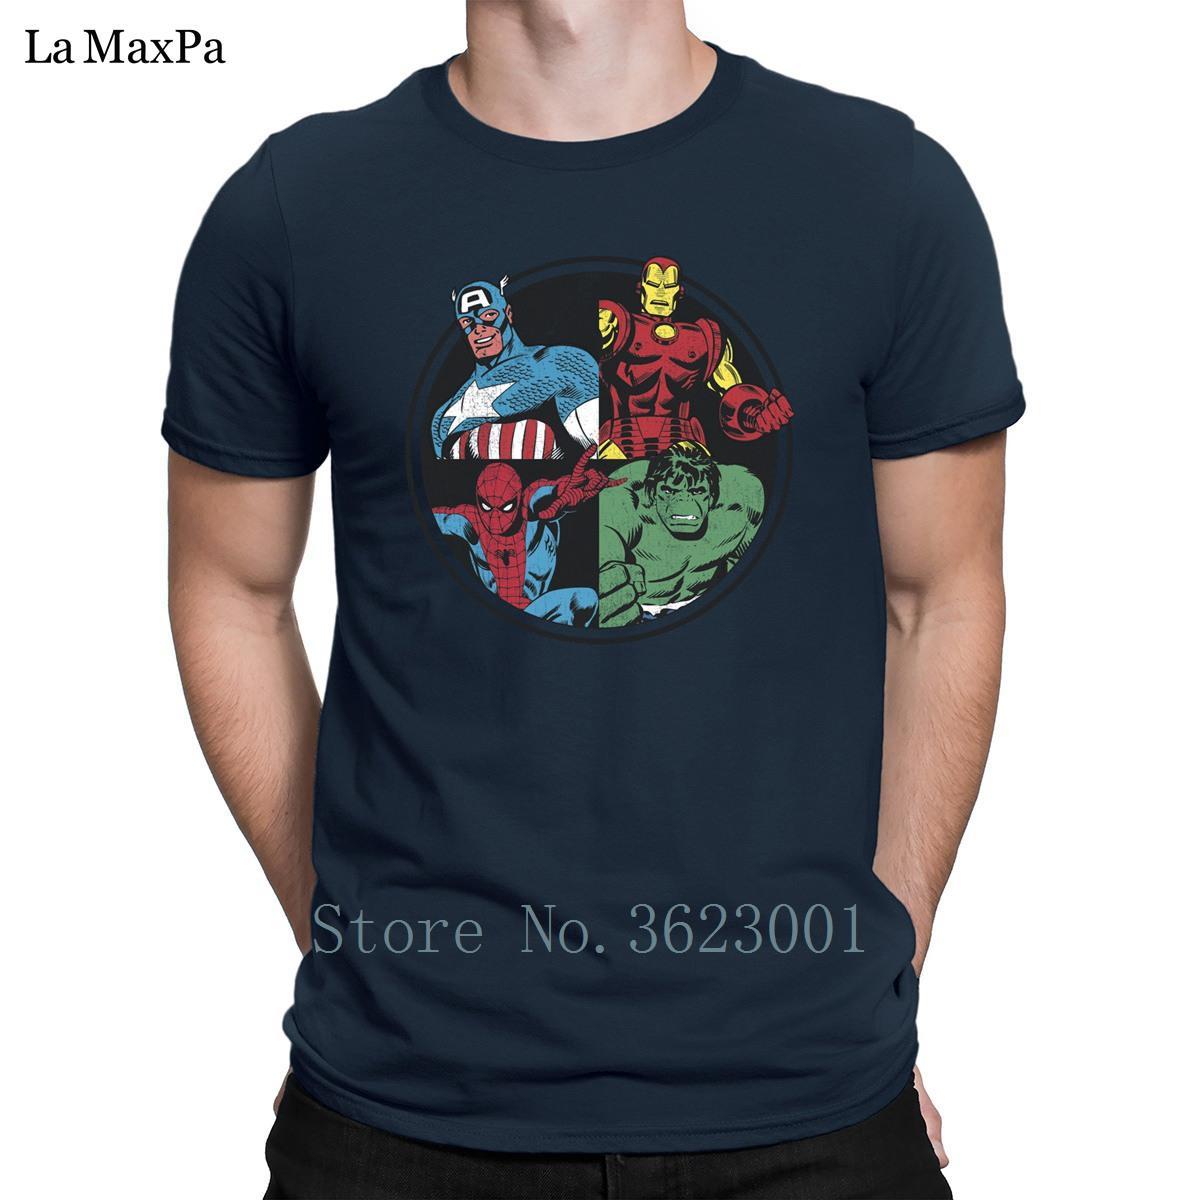 Lustige Trend-T-Shirt Sommer Avengers Assemble T-Shirts für Herren Belieben Funky Herren Größe S-3XL T-Shirt Hip Hop